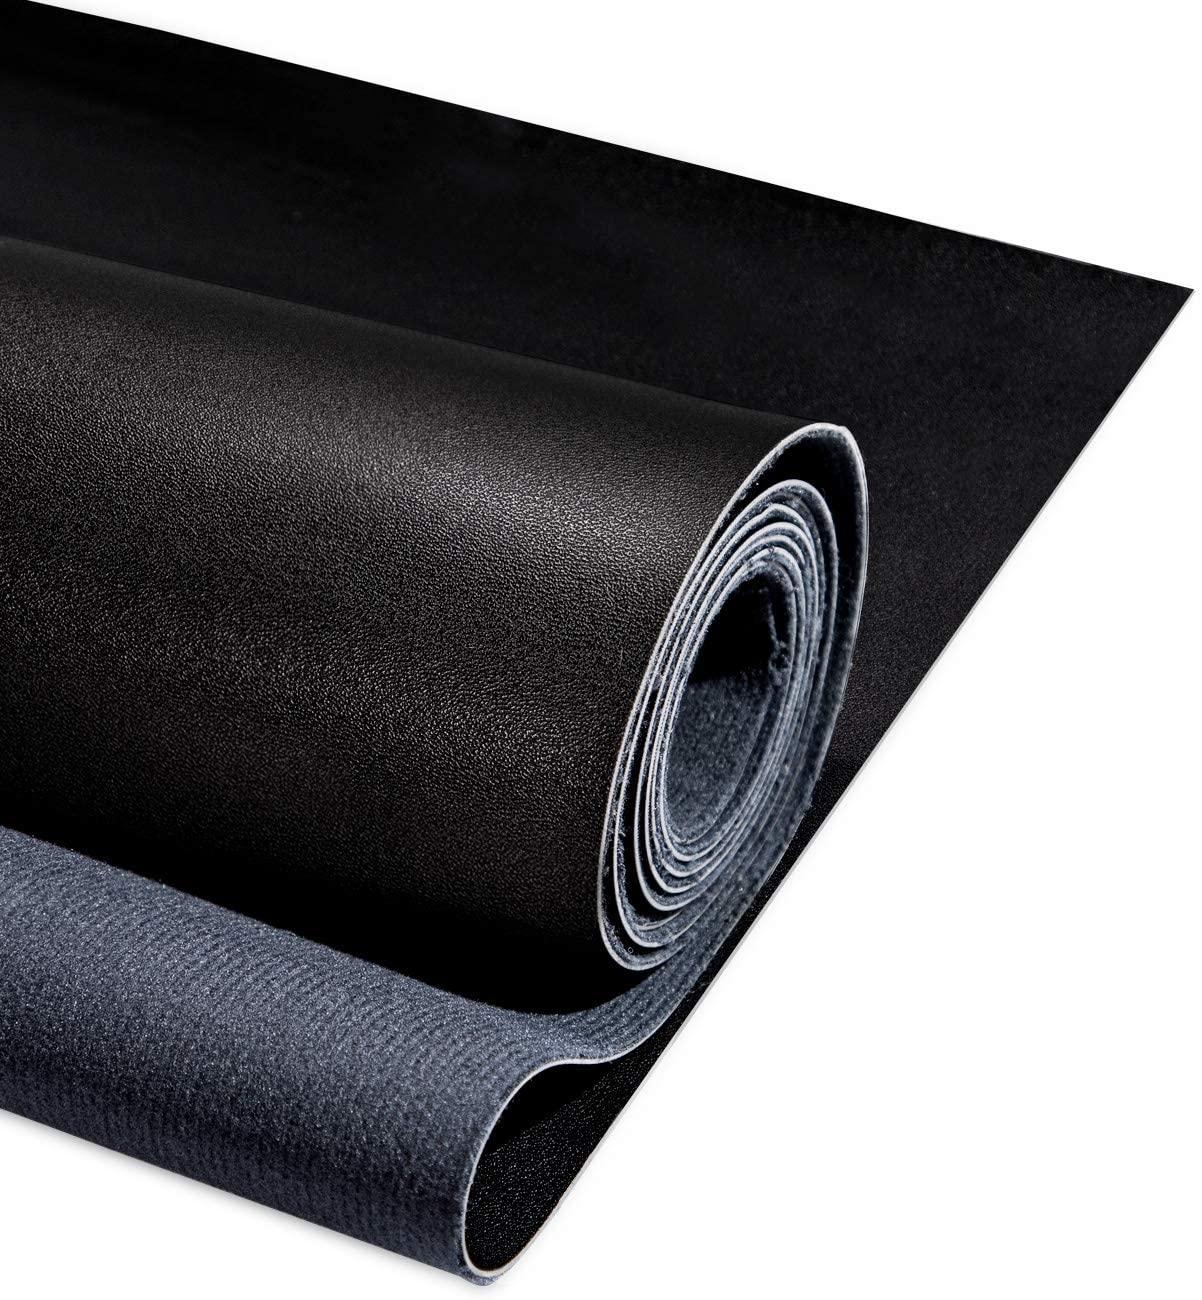 PU Fabric Leather 2 Yards 54